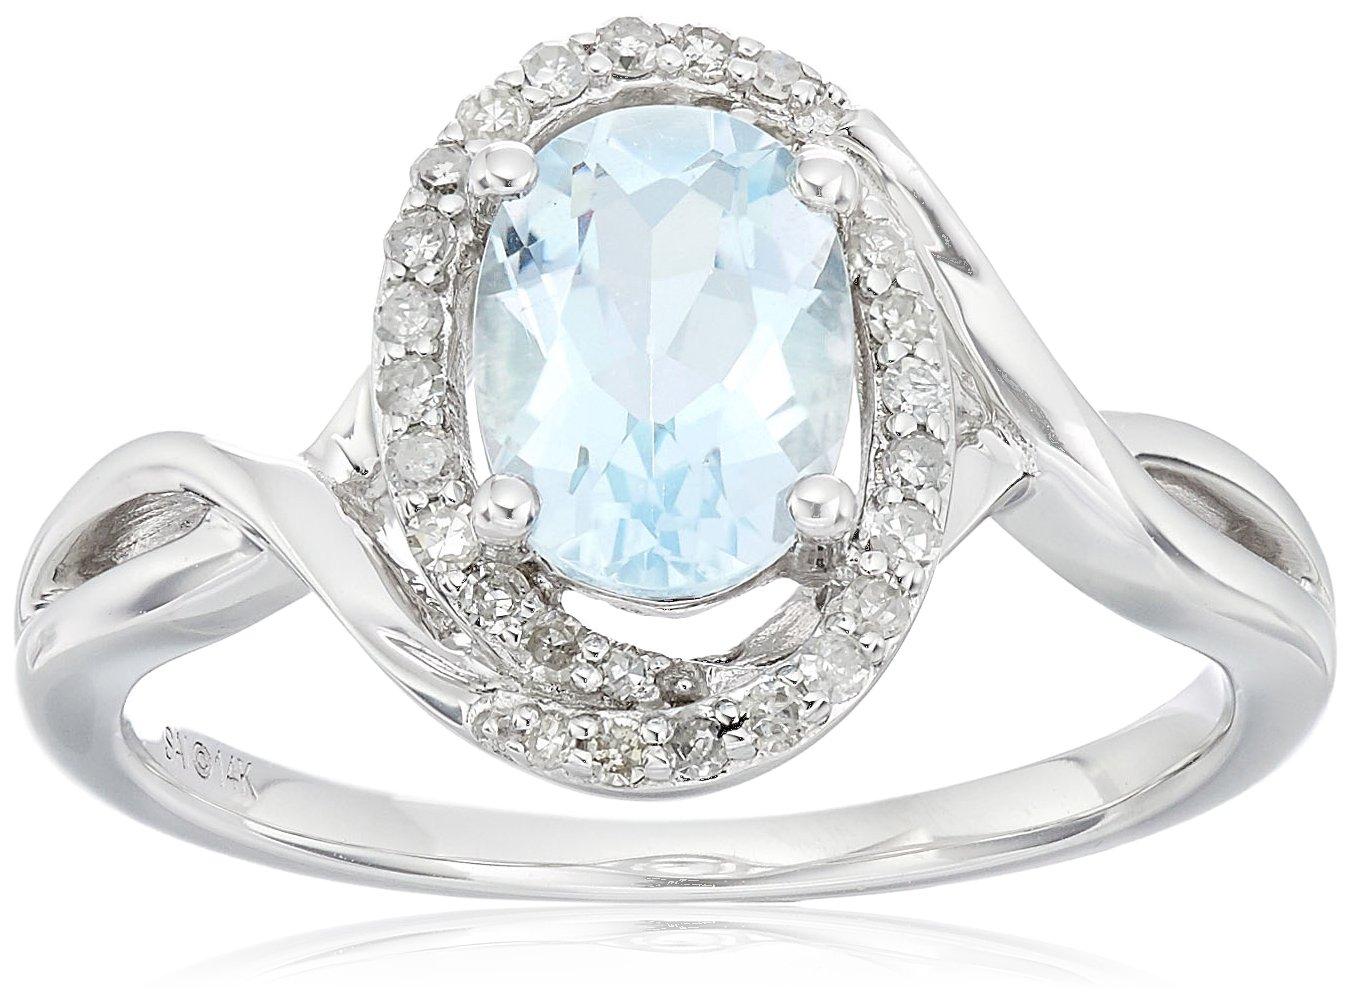 14k White Gold, Aquamarine, and Diamond Ring (1/6 cttw, H-I Color, I2-I3 Clarity), Size 7